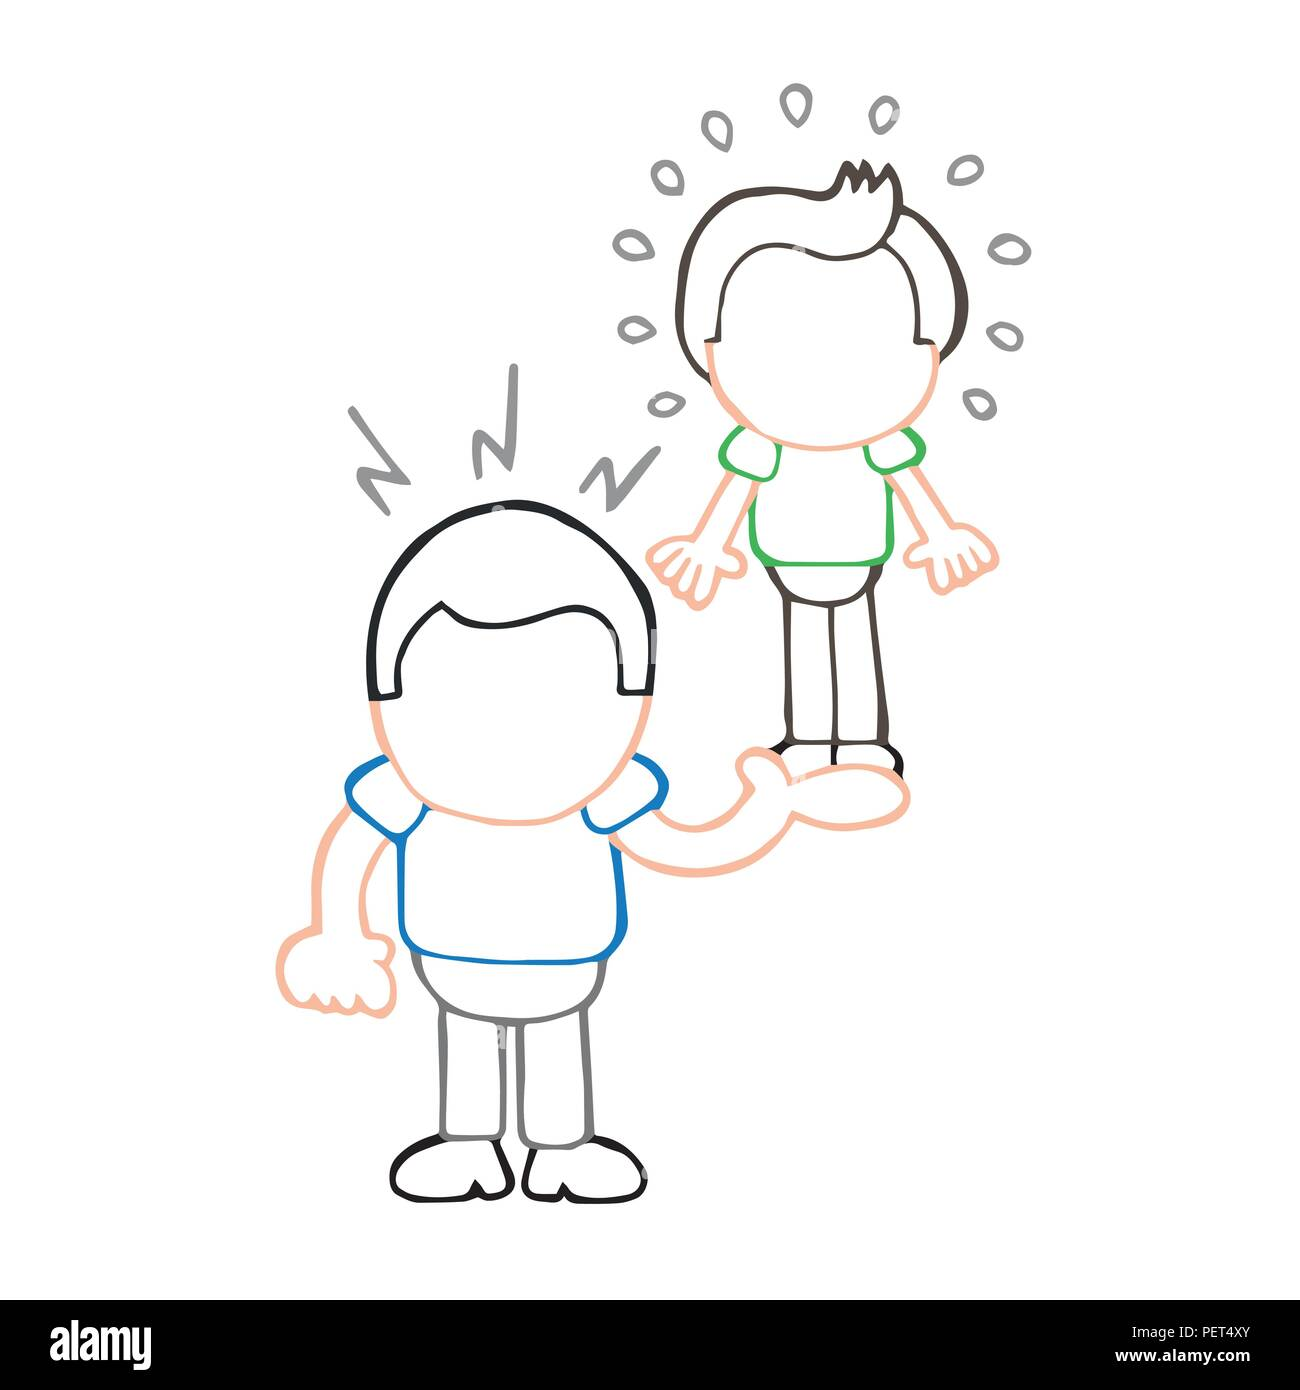 Vector hand-drawn cartoon illustration of muscleman lifting puny guy. - Stock Image